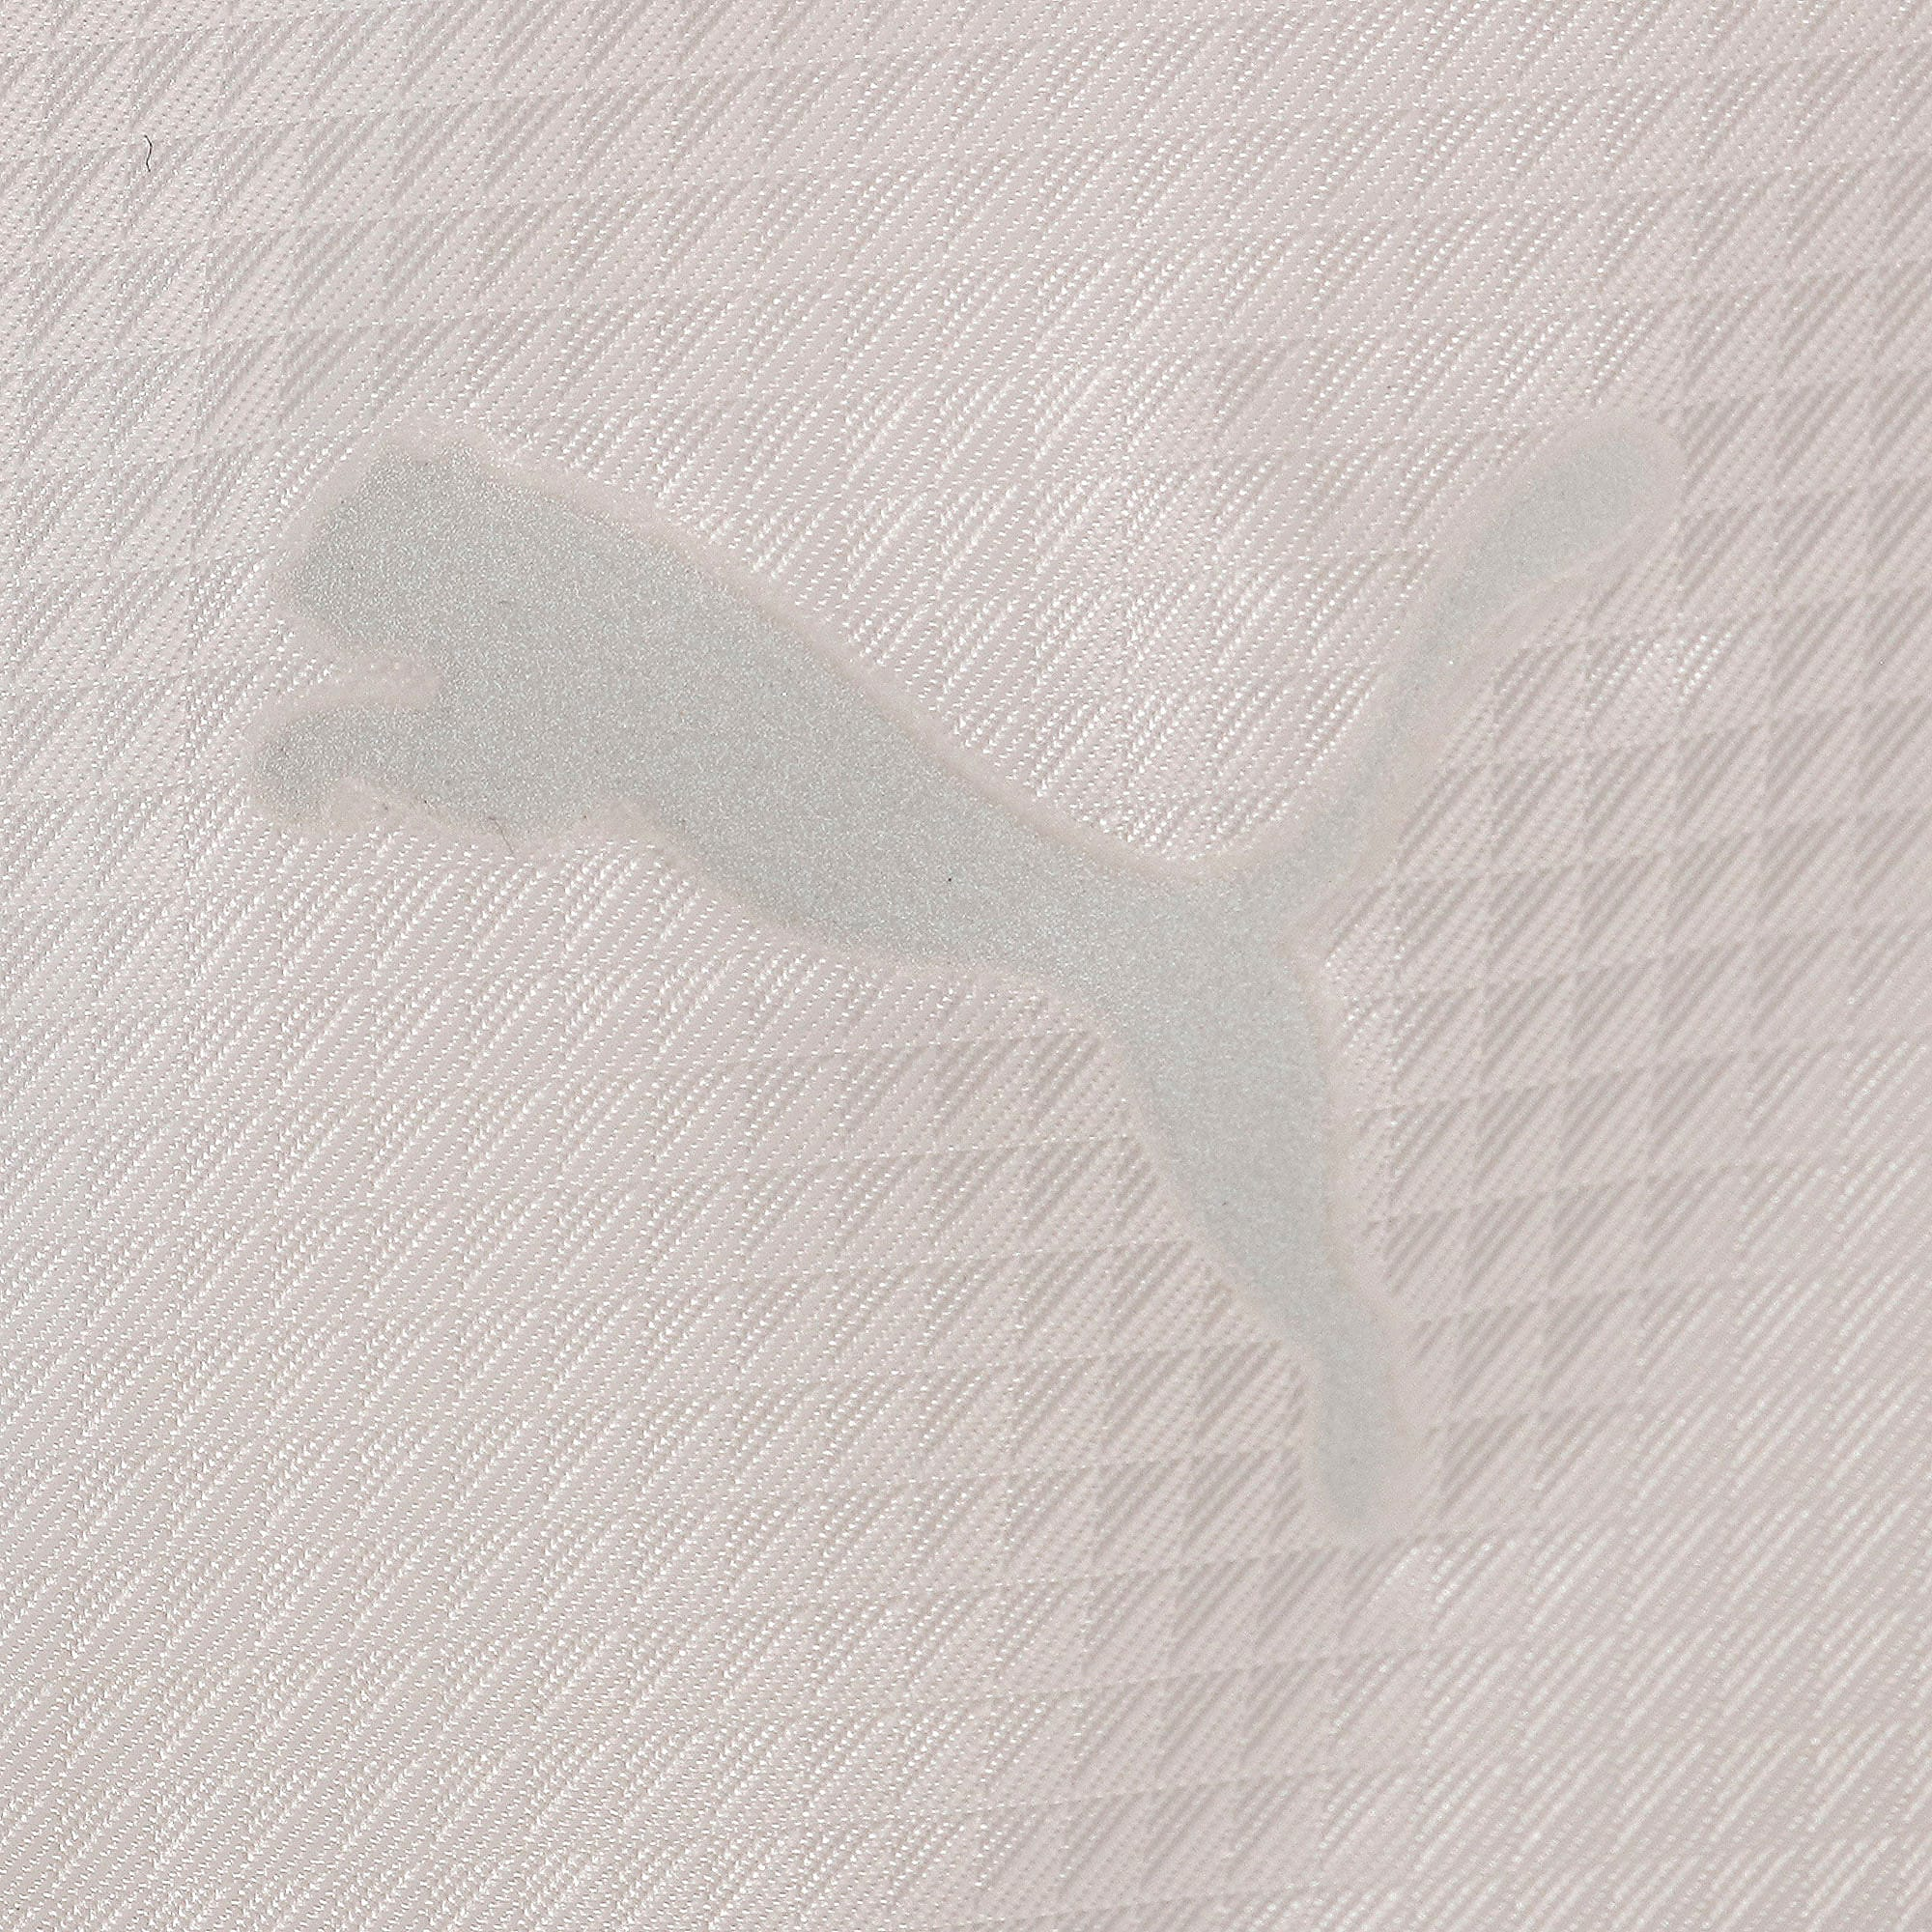 Thumbnail 7 of SG x PUMA ウィメンズ ジャケット, Puma White, medium-JPN